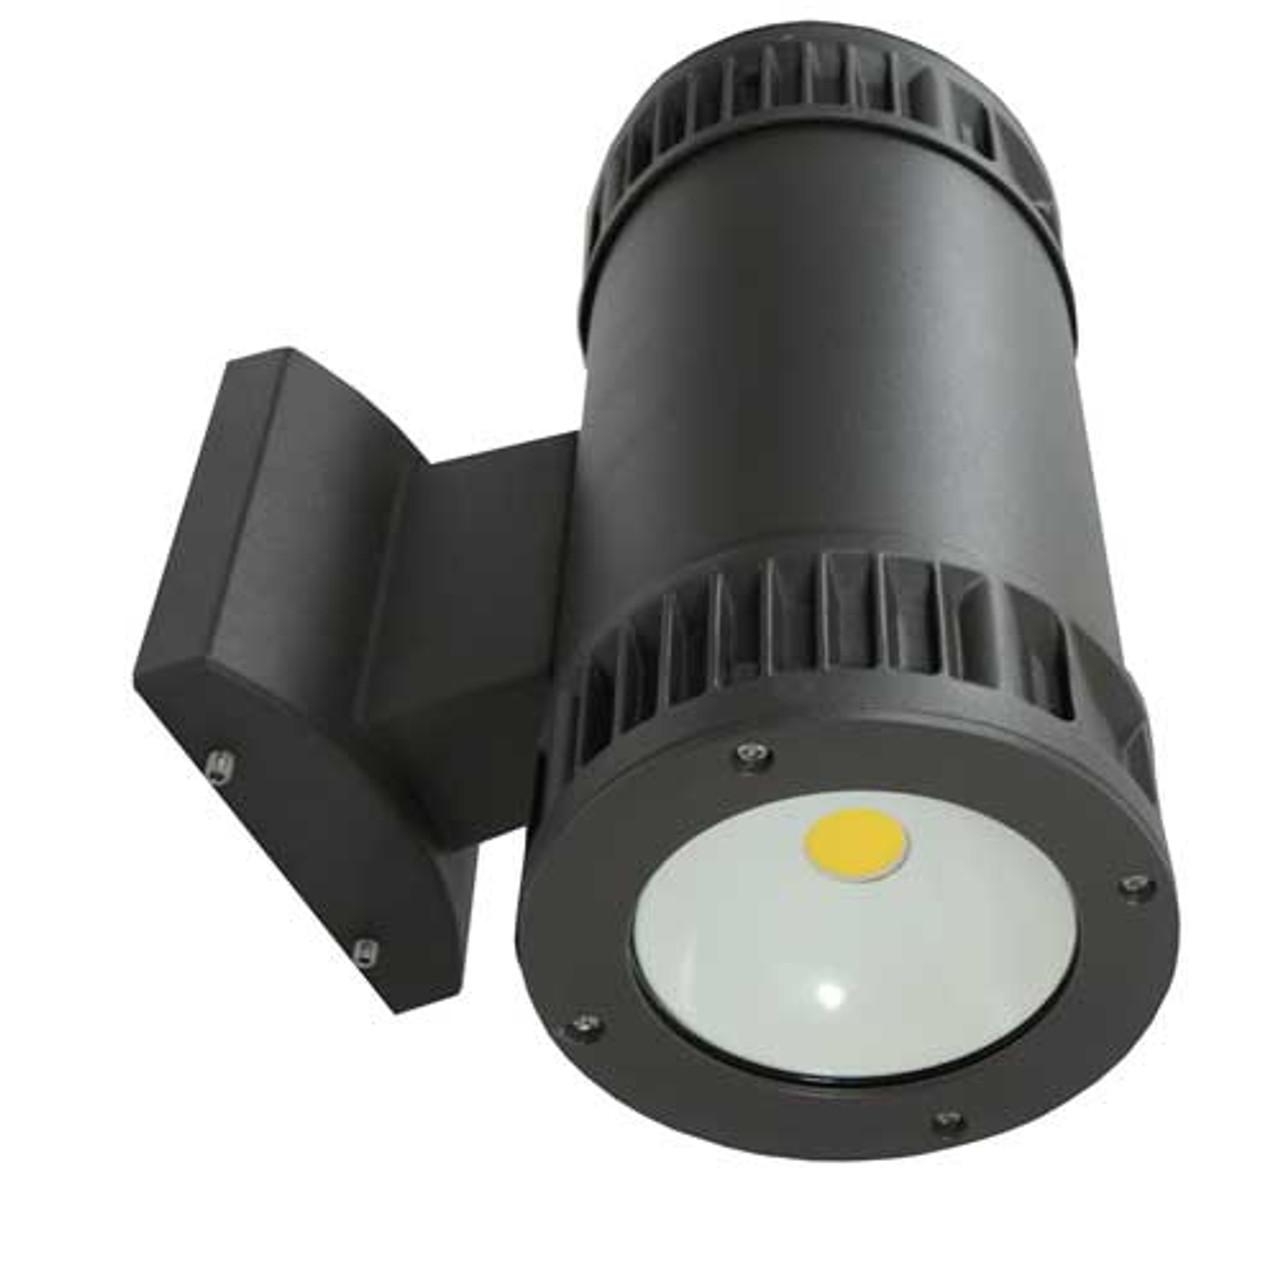 40W LED UP/Down Turbine Cylinder Light